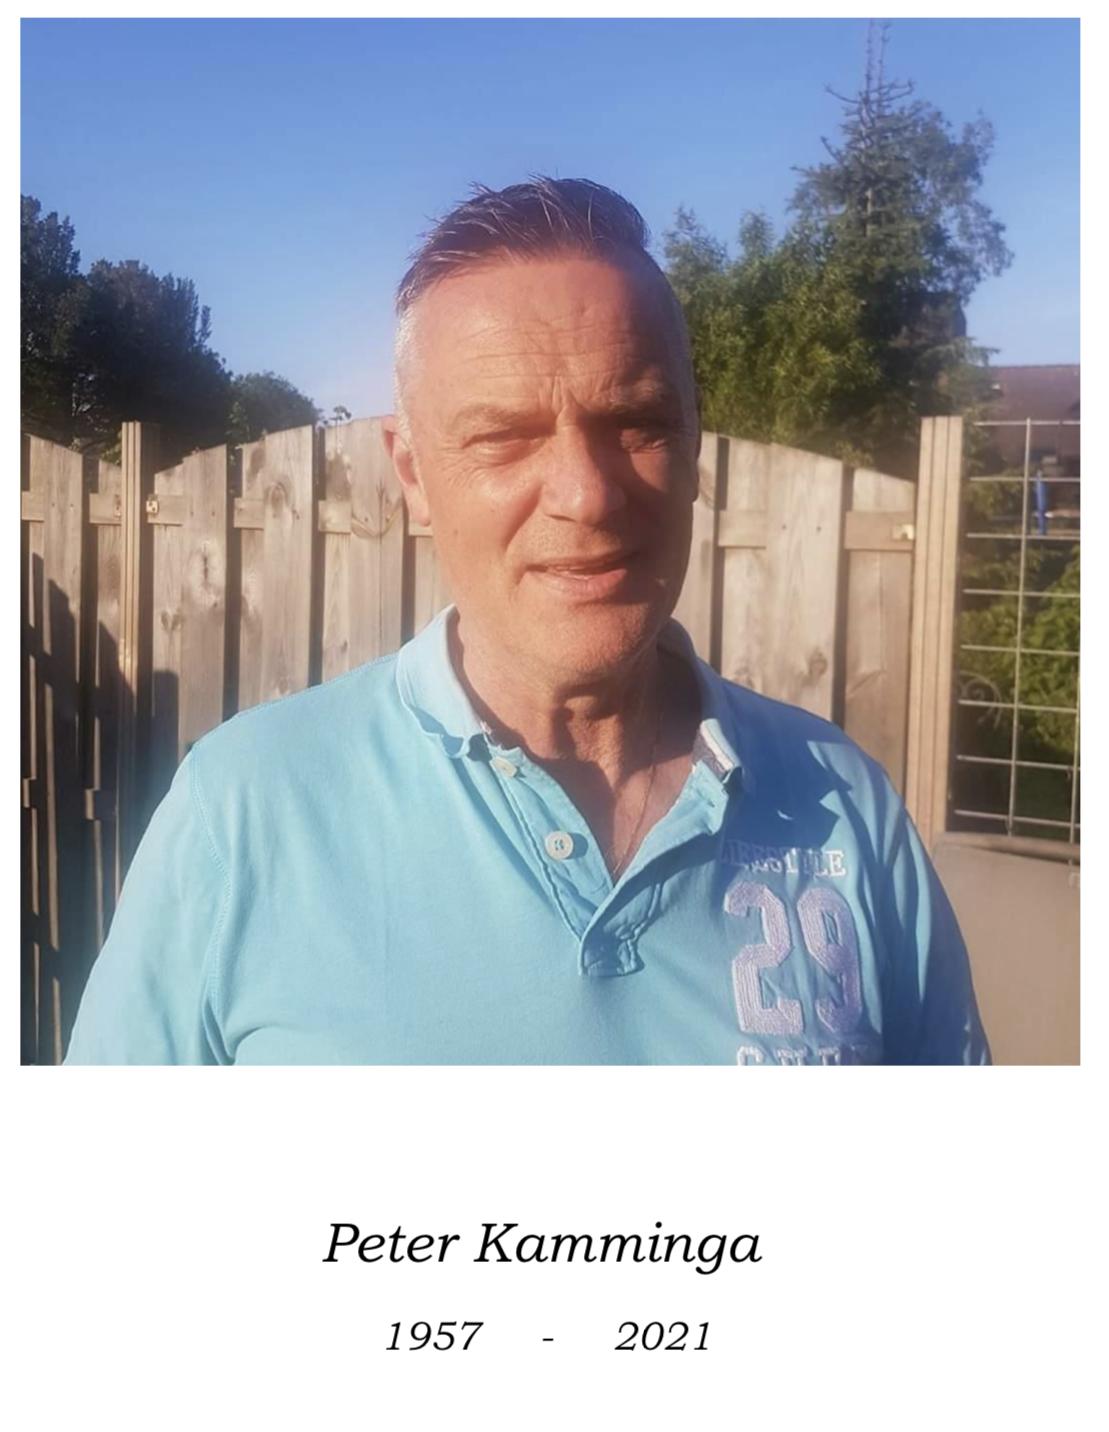 Peter Kamminga overleden